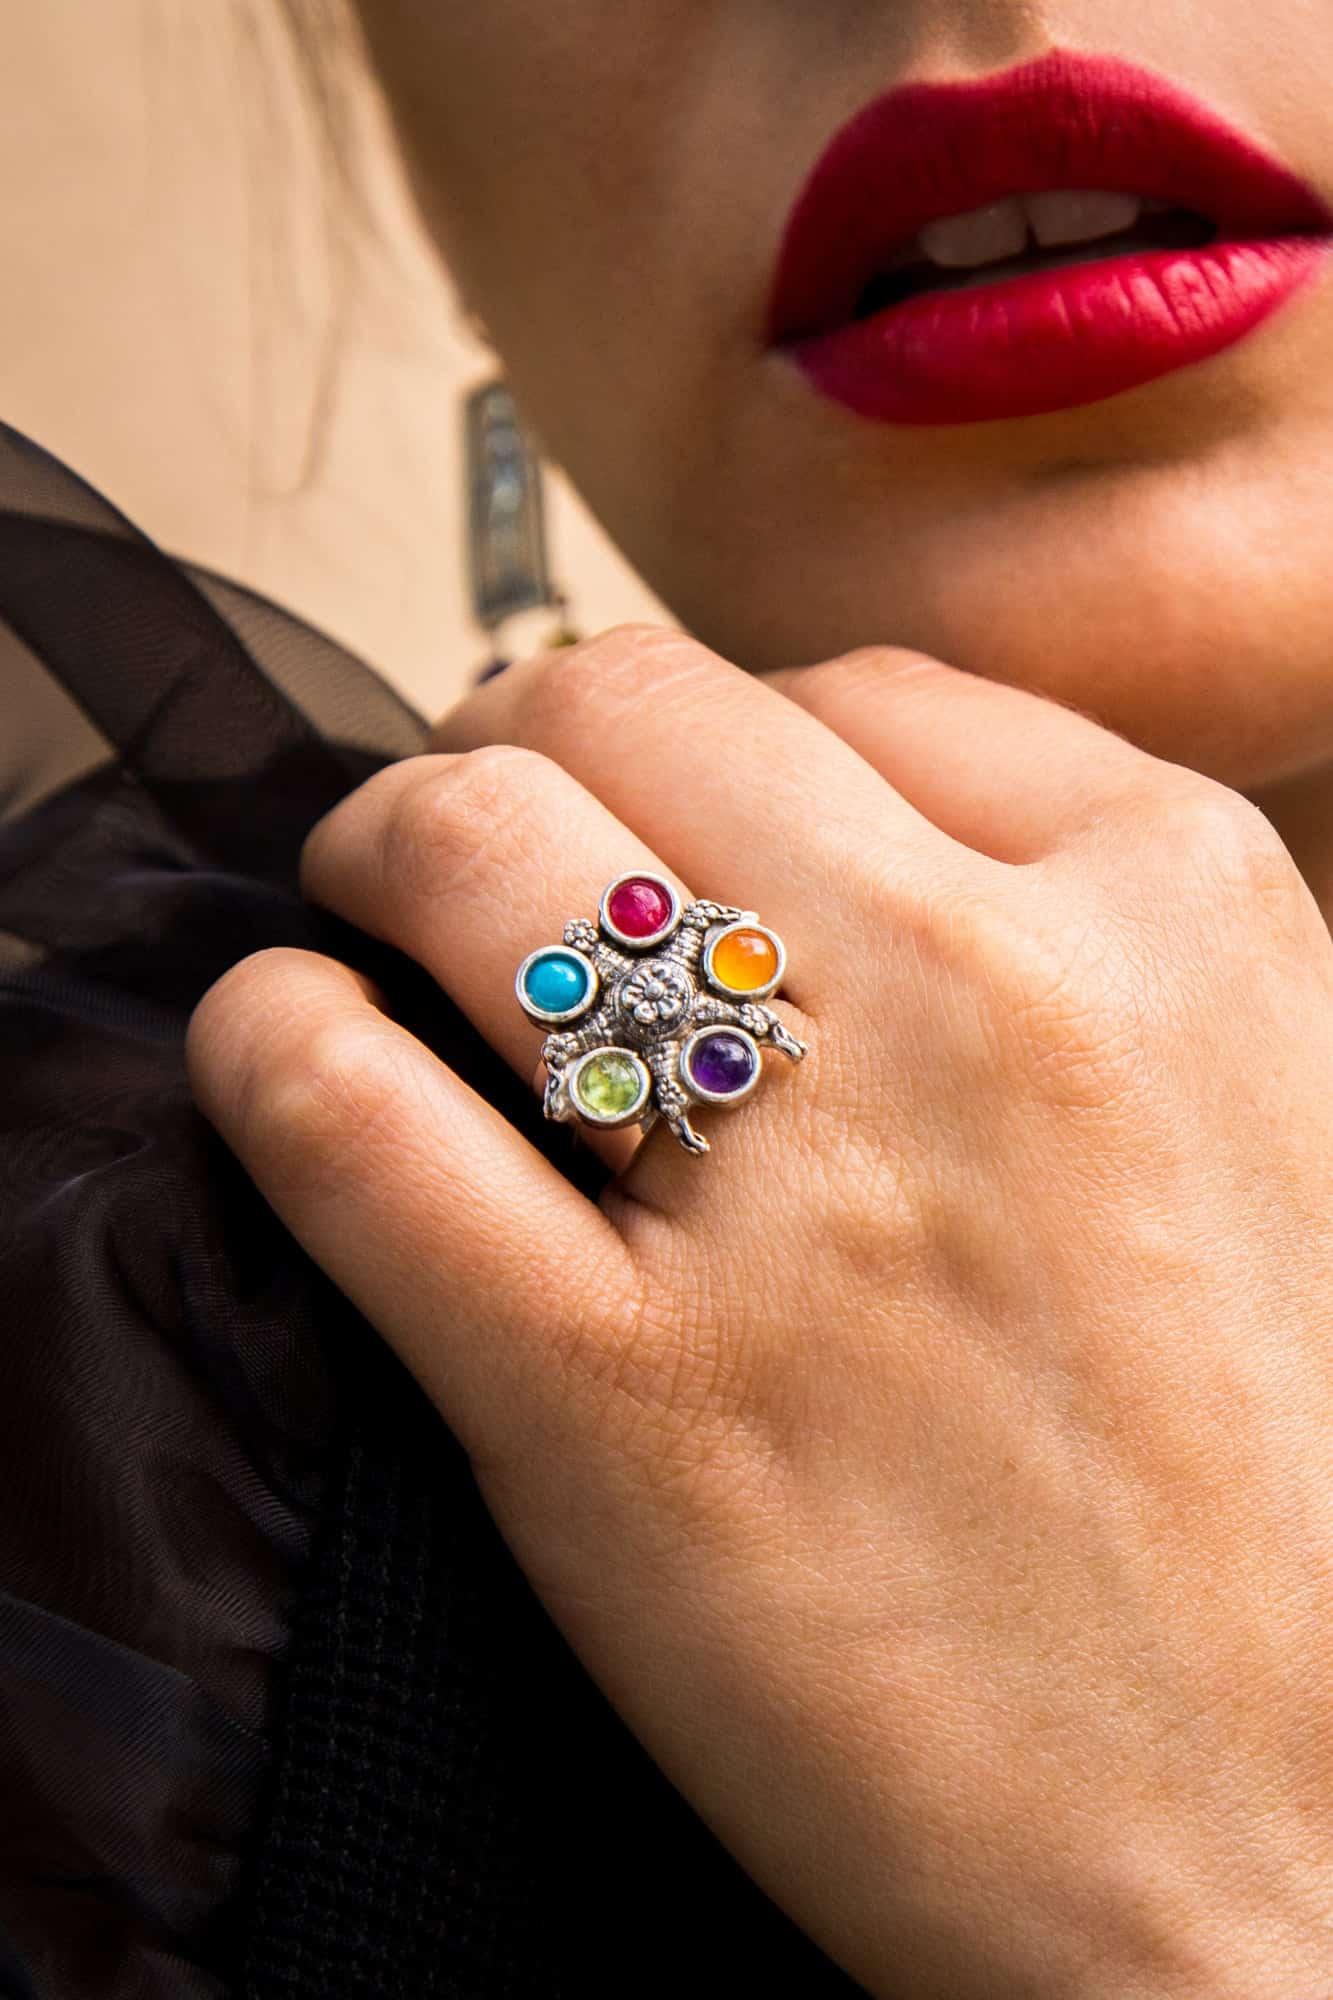 joyas mexicanas gabriela sanchez anillo pinata chica de colores